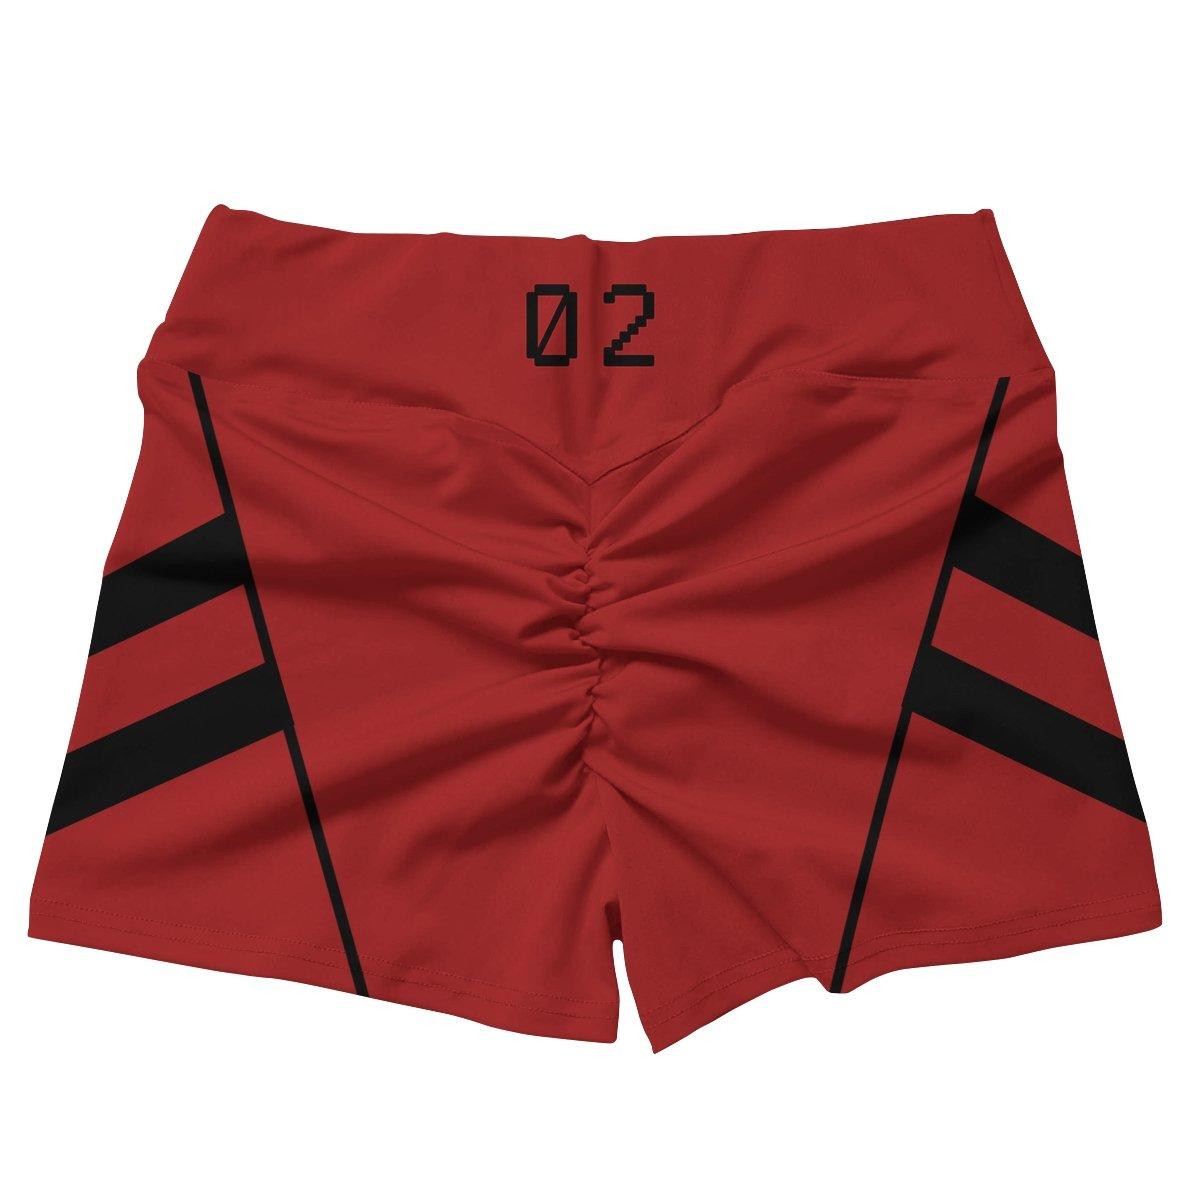 neon genesis asuka active wear set 384017 - Anime Swimsuits